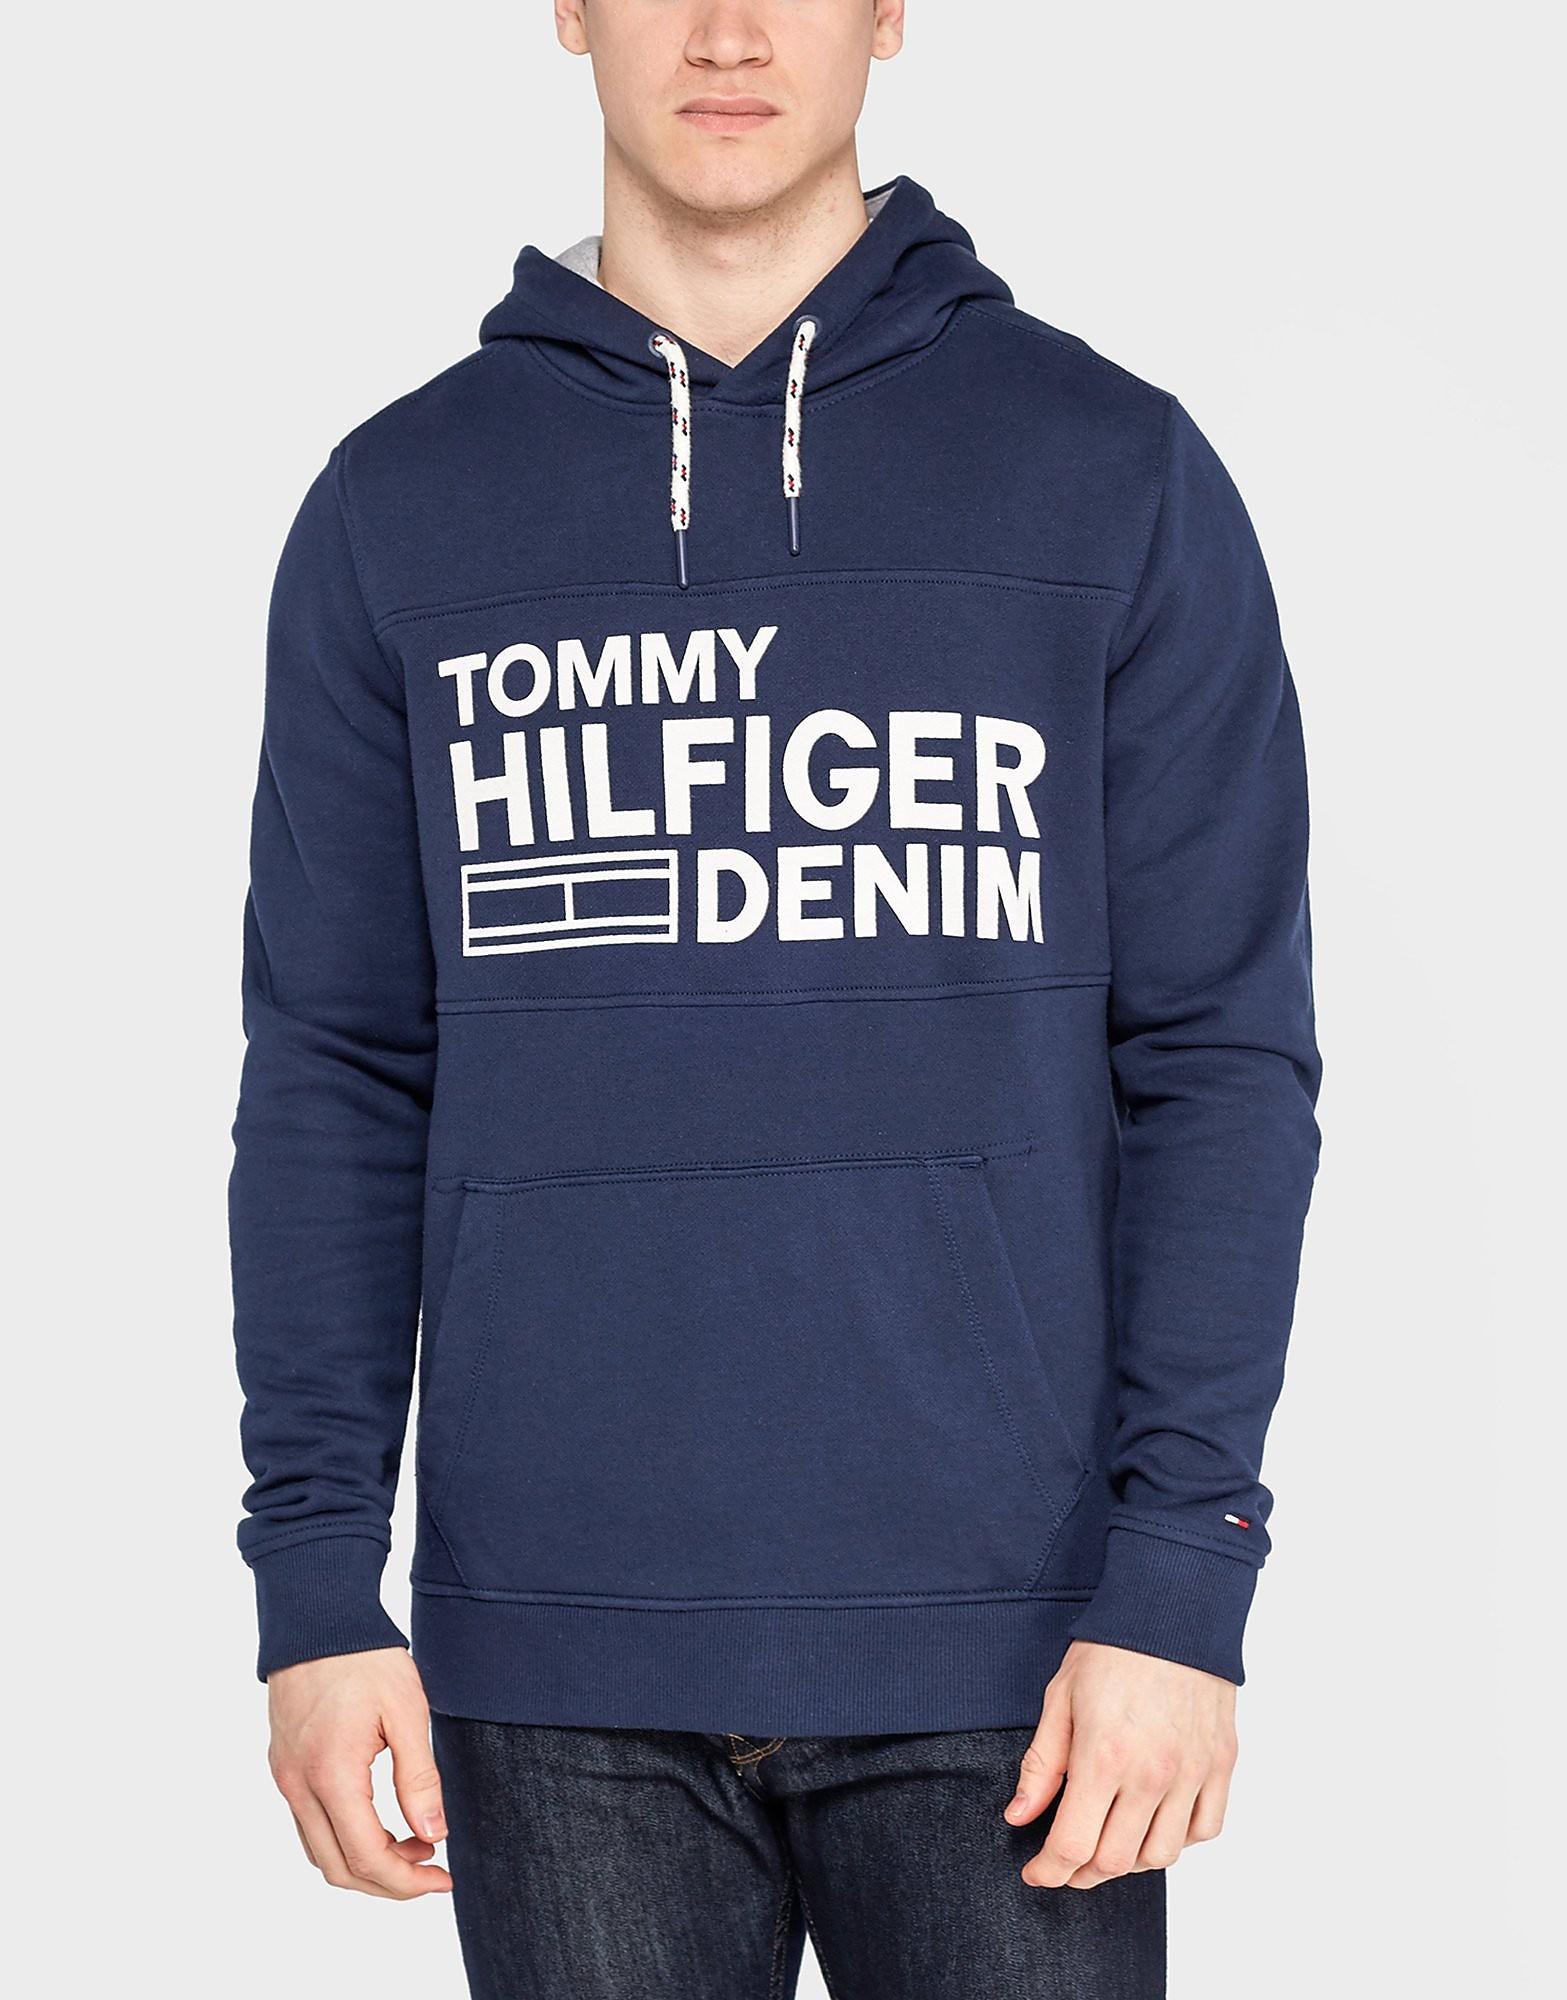 Tommy Hilfiger Branded Hoody